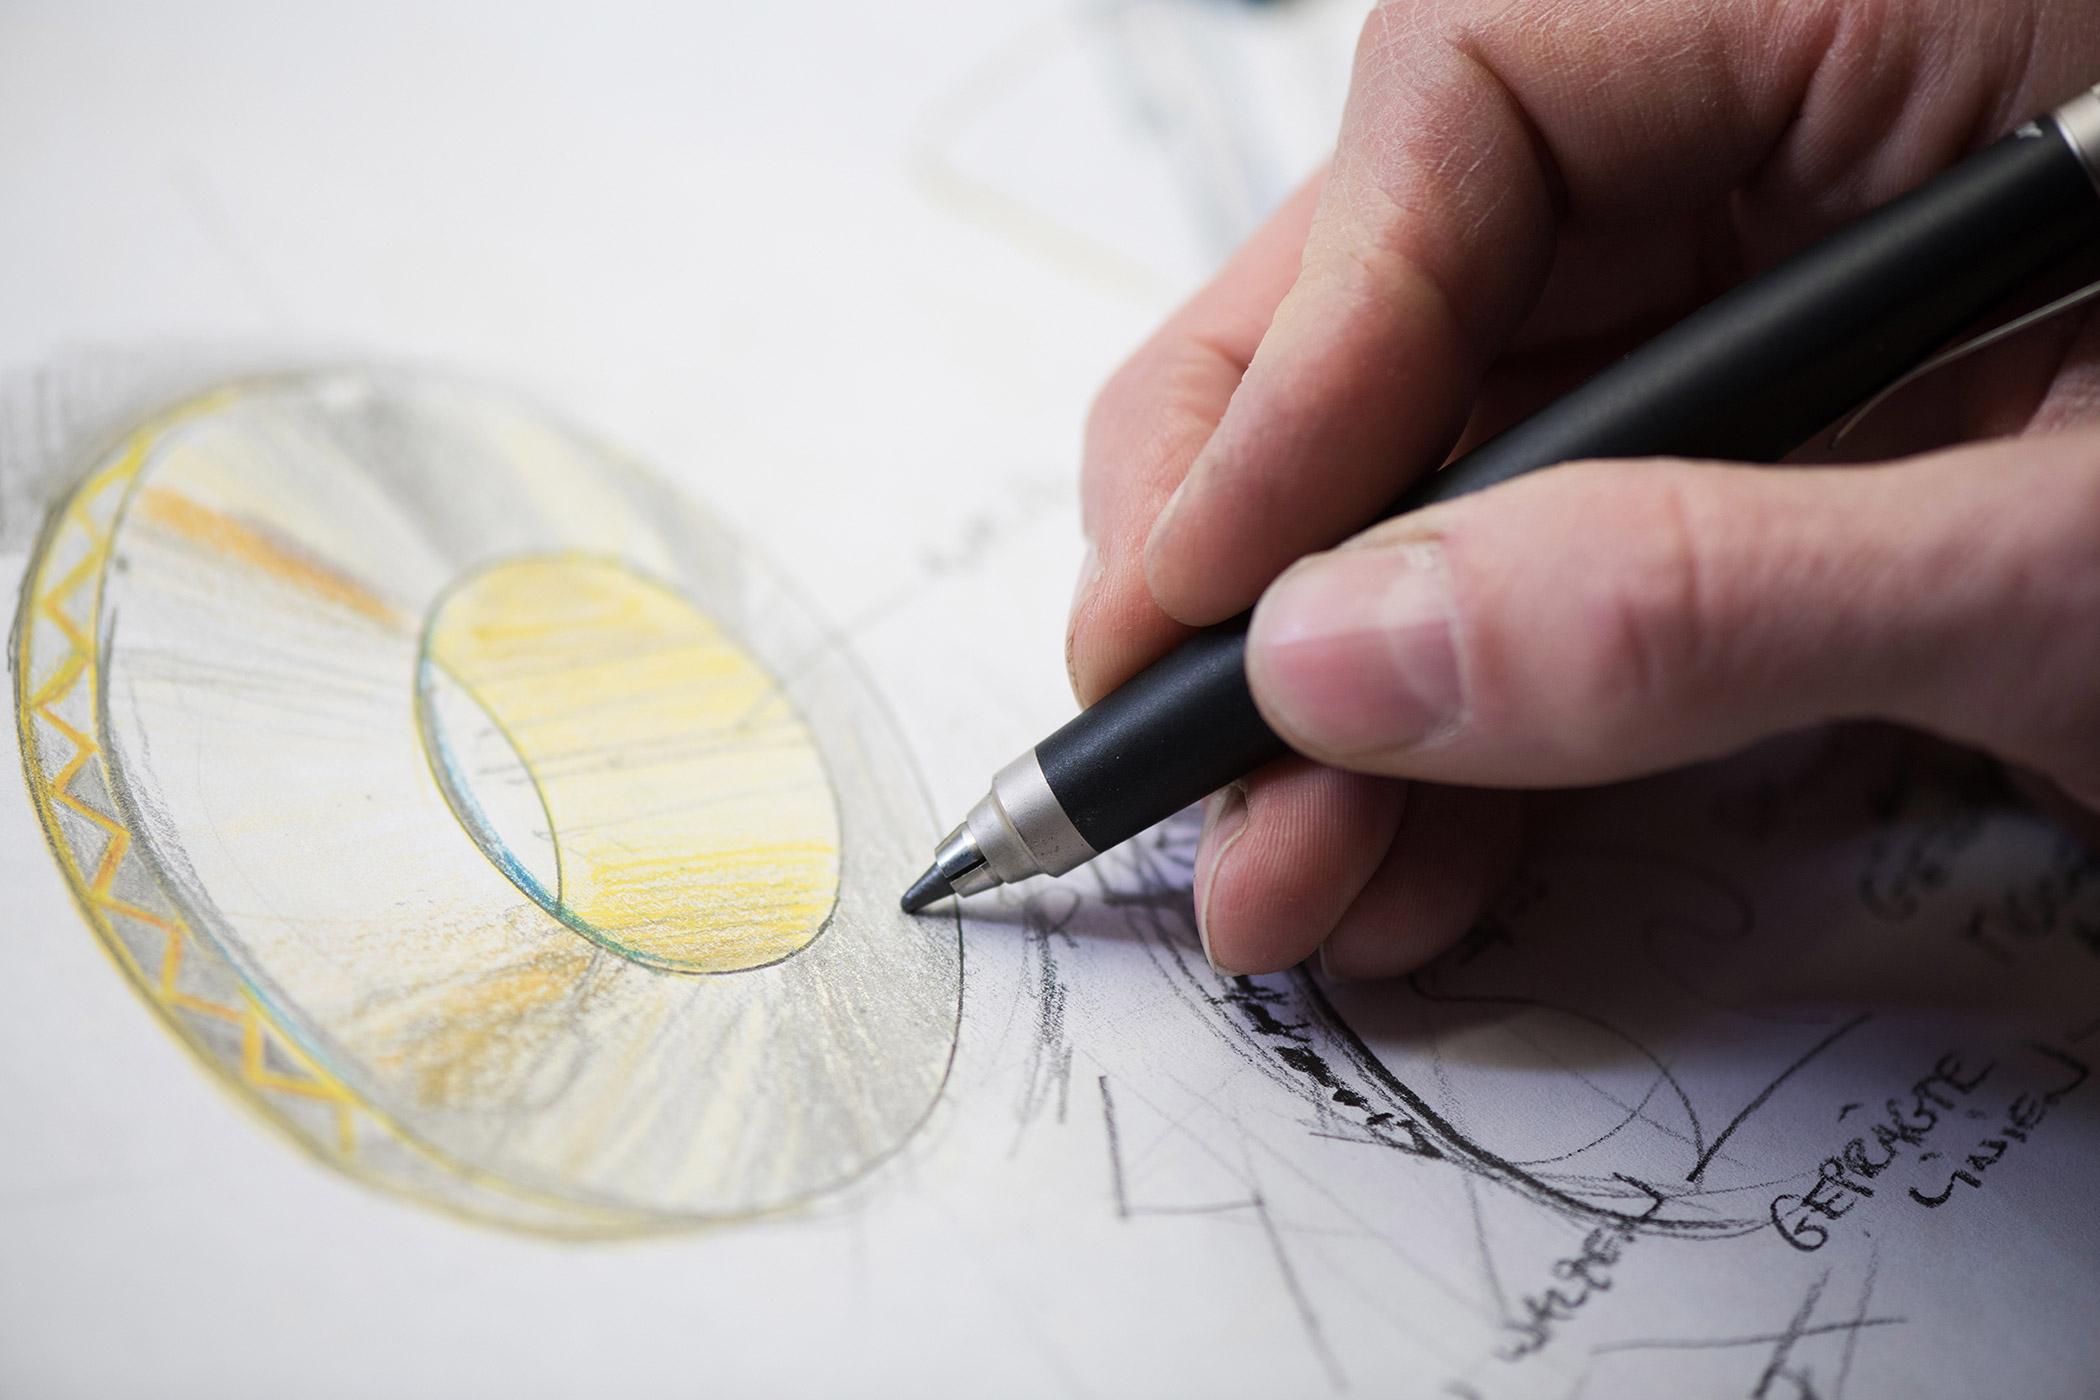 Entwurf eigener Schmuck-Kollektionen